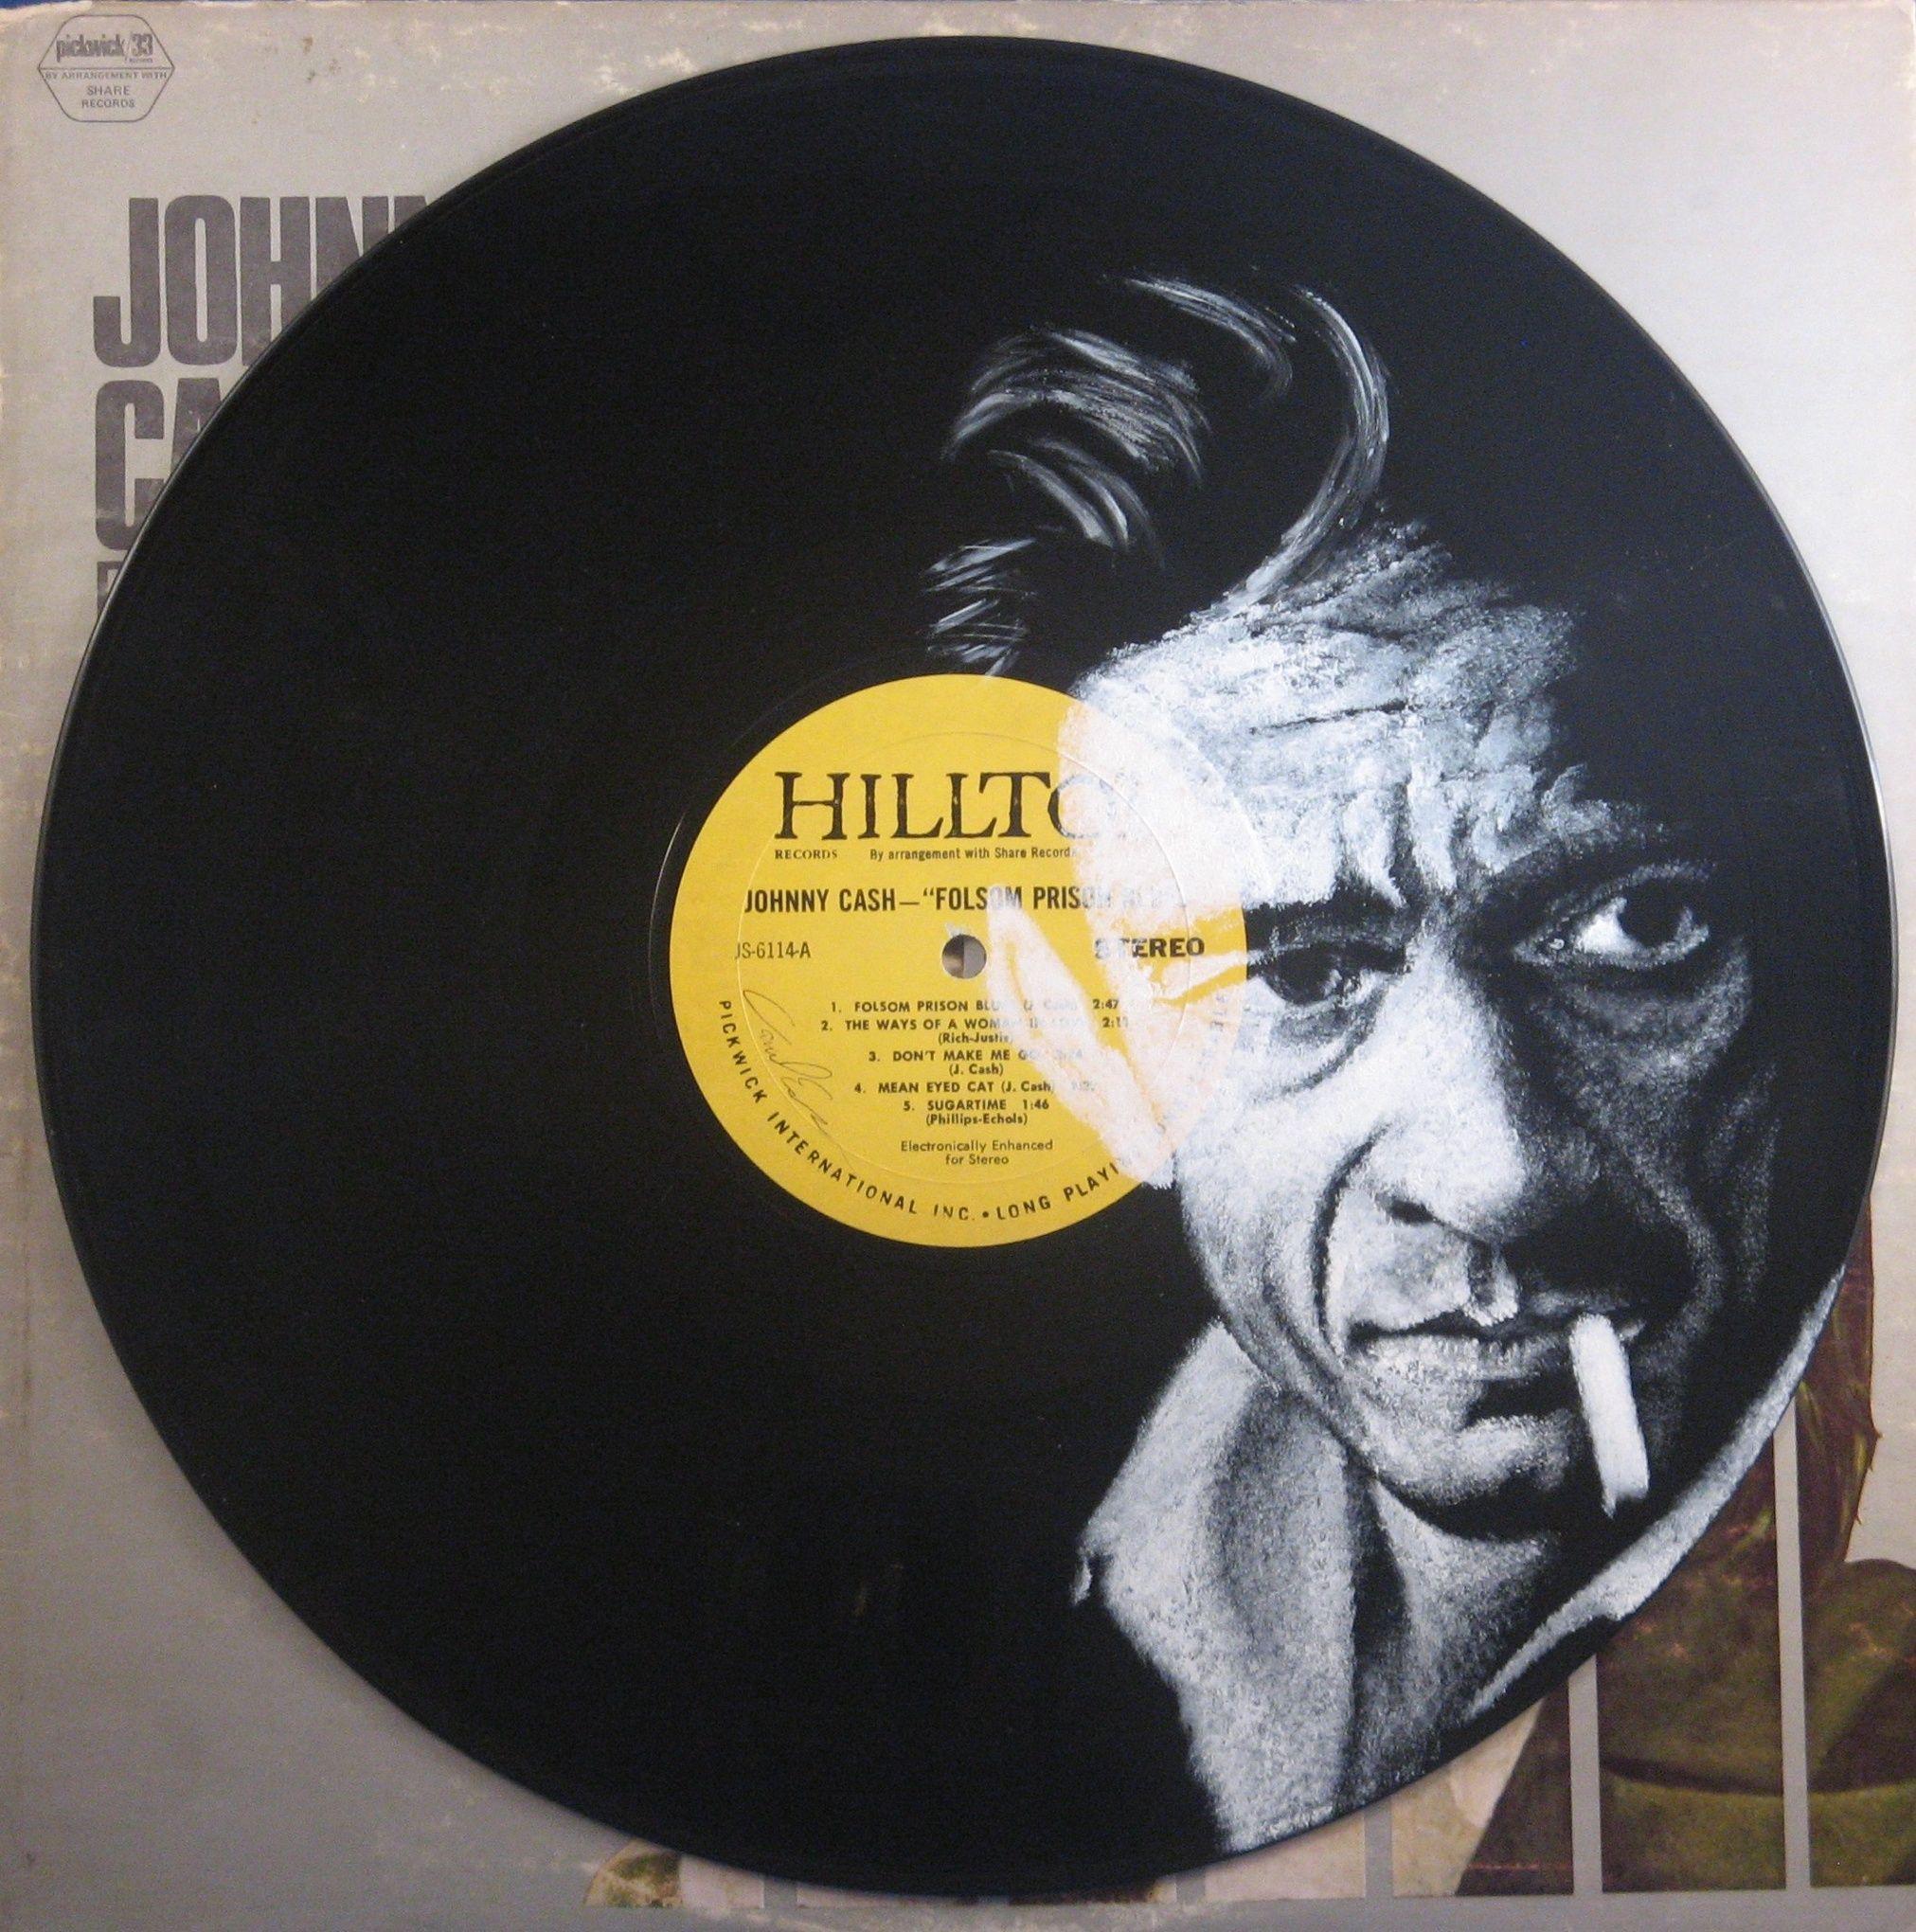 The Vinyl Art Of Daniel Edlen In Pictures Vinyl Record Art Record Albums Art Vinyl Art